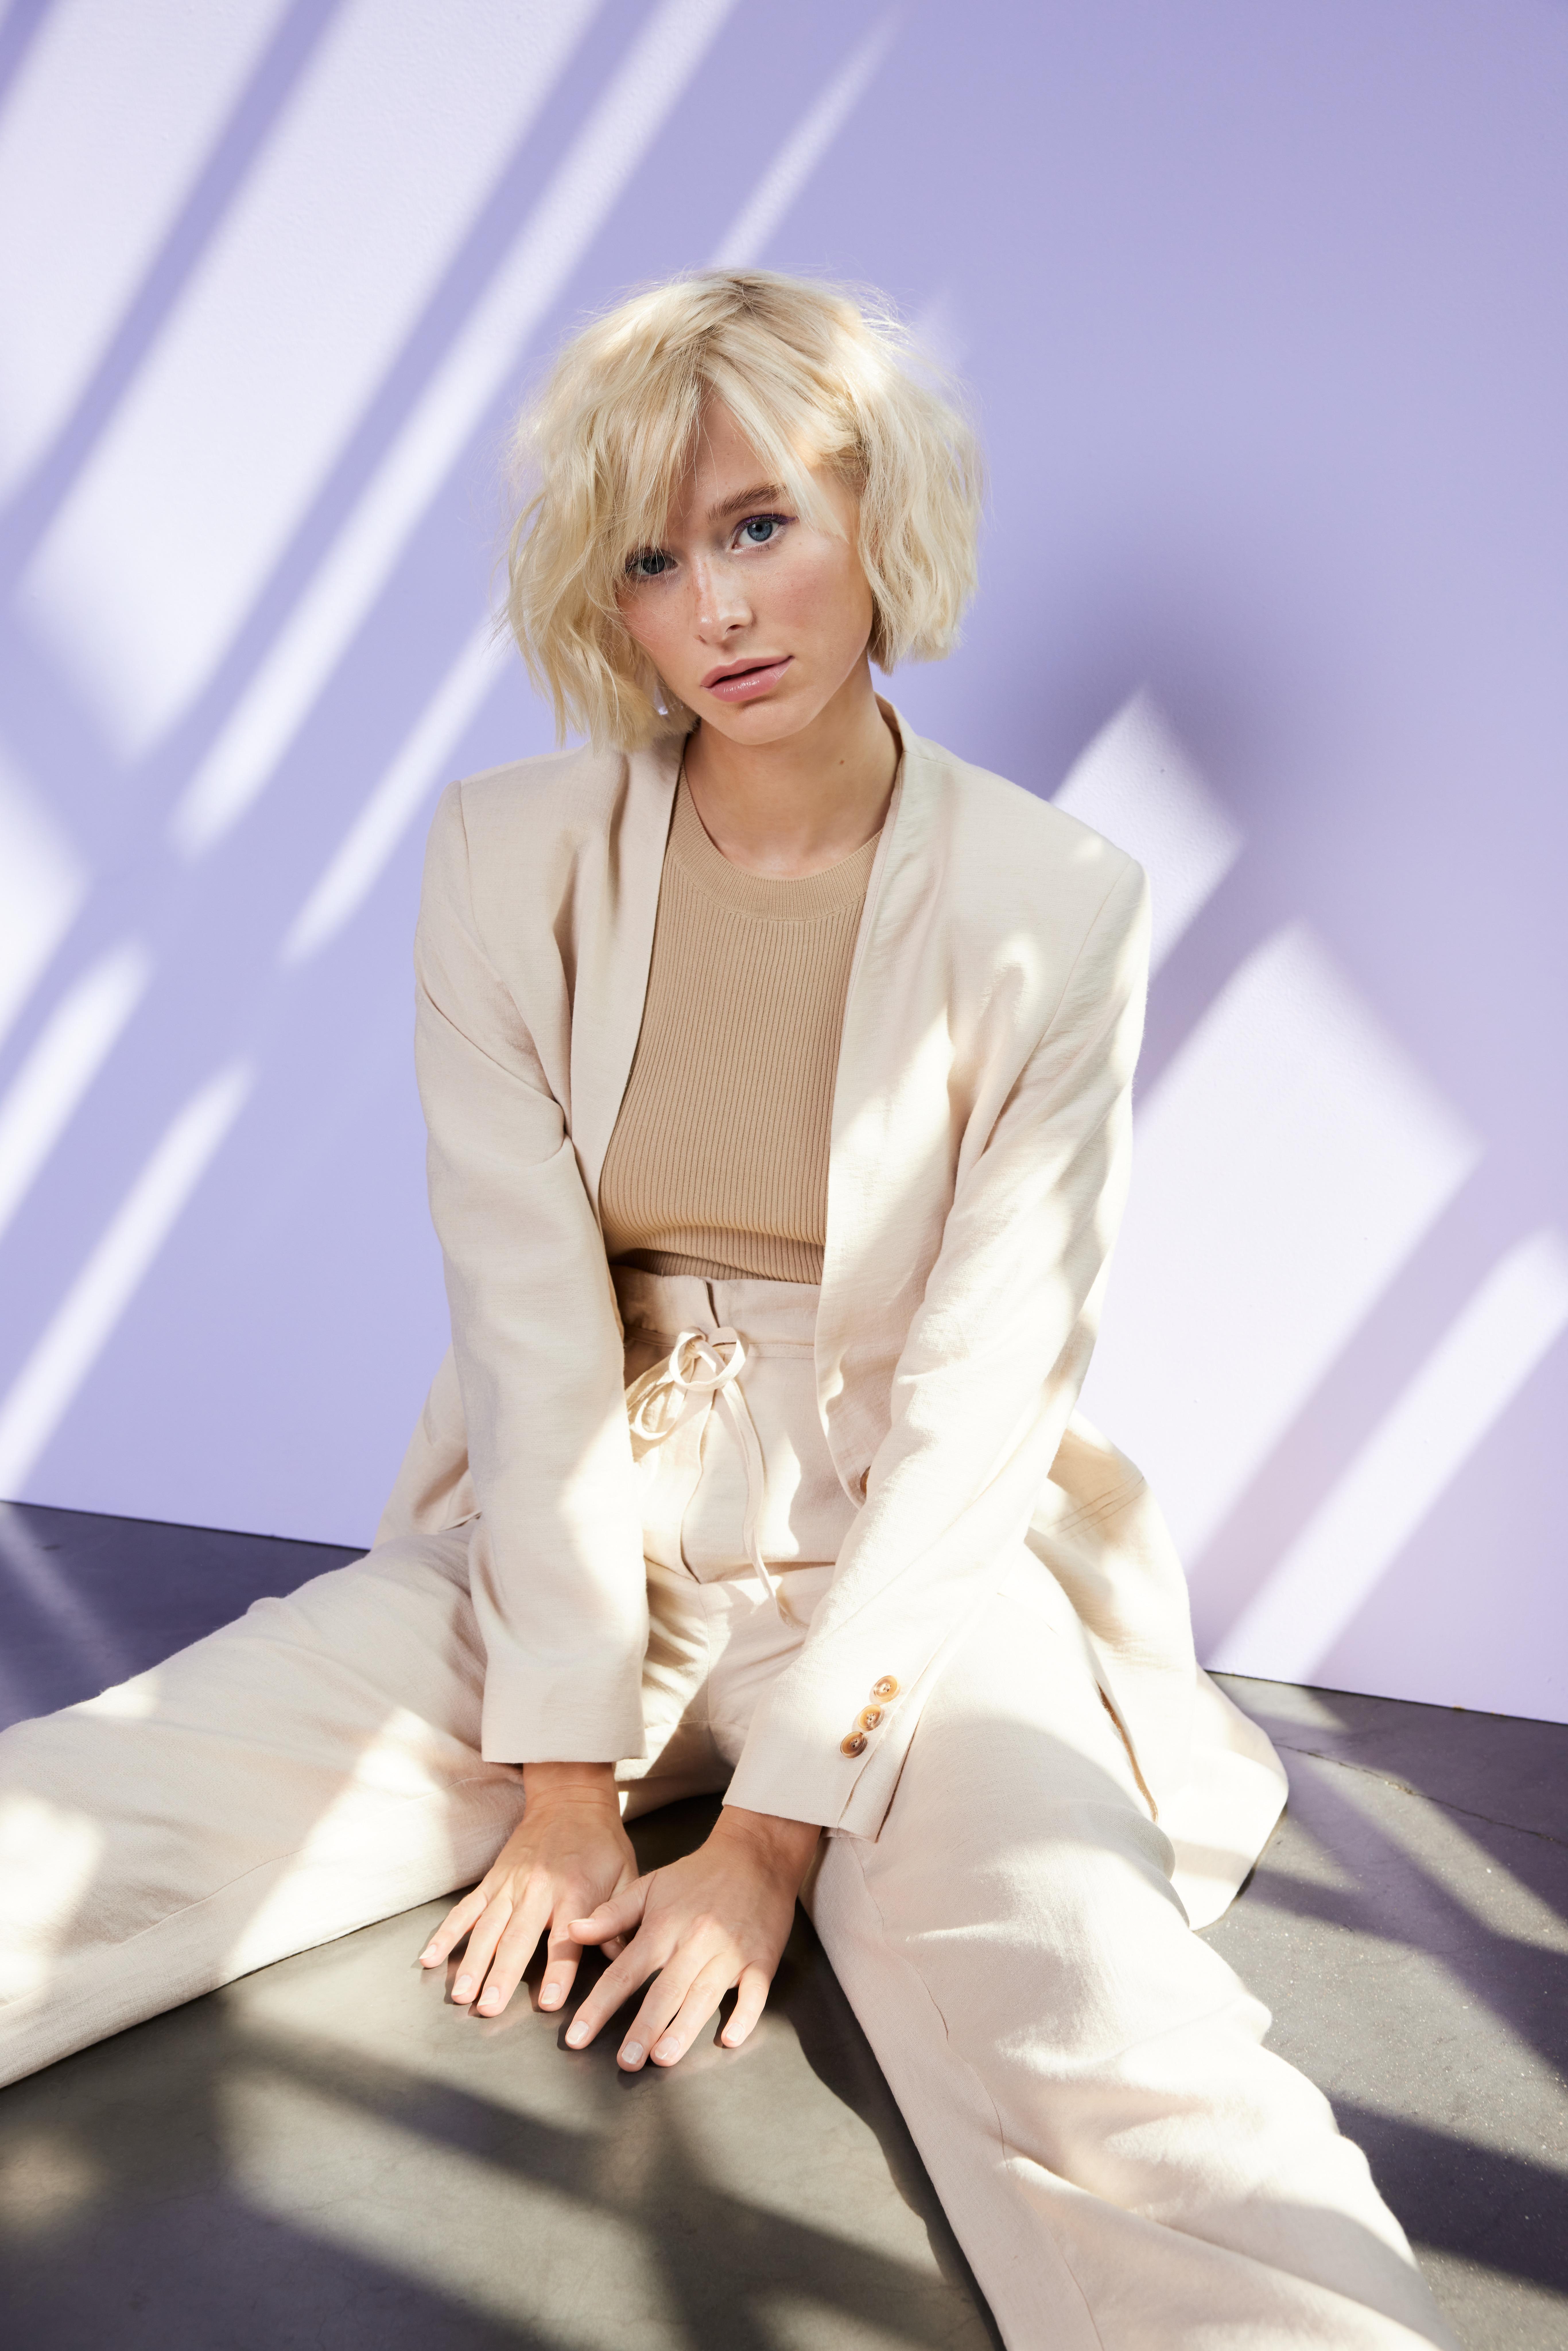 hochsteckfrisur steckfrisur pflechtfrisur damenhaarschnitt ombre balayage Damen frisuren blond hübsche frau im kesselhaus in lauenau